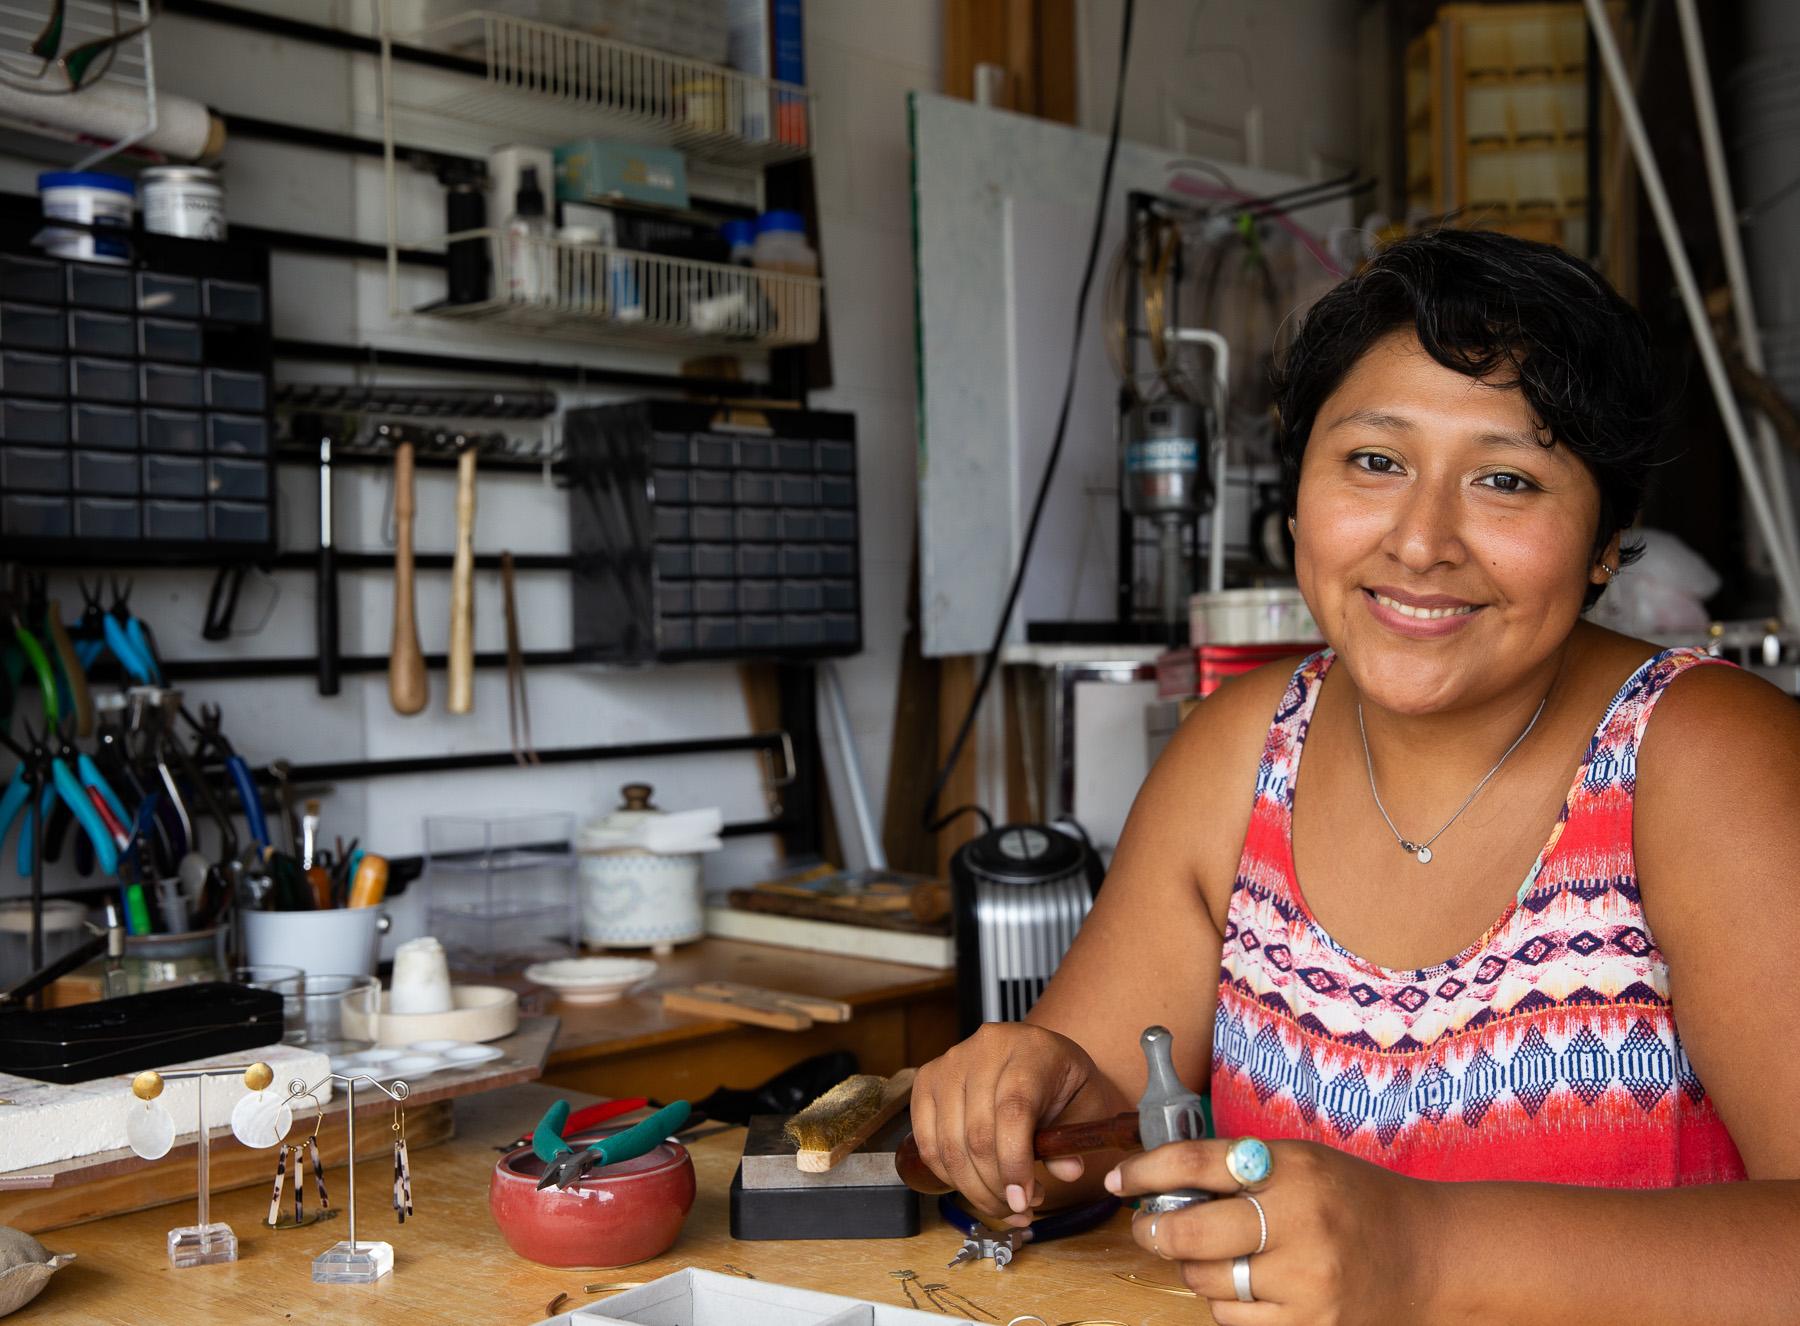 Orlando jewelry designer Carla Poma creating in her studio.